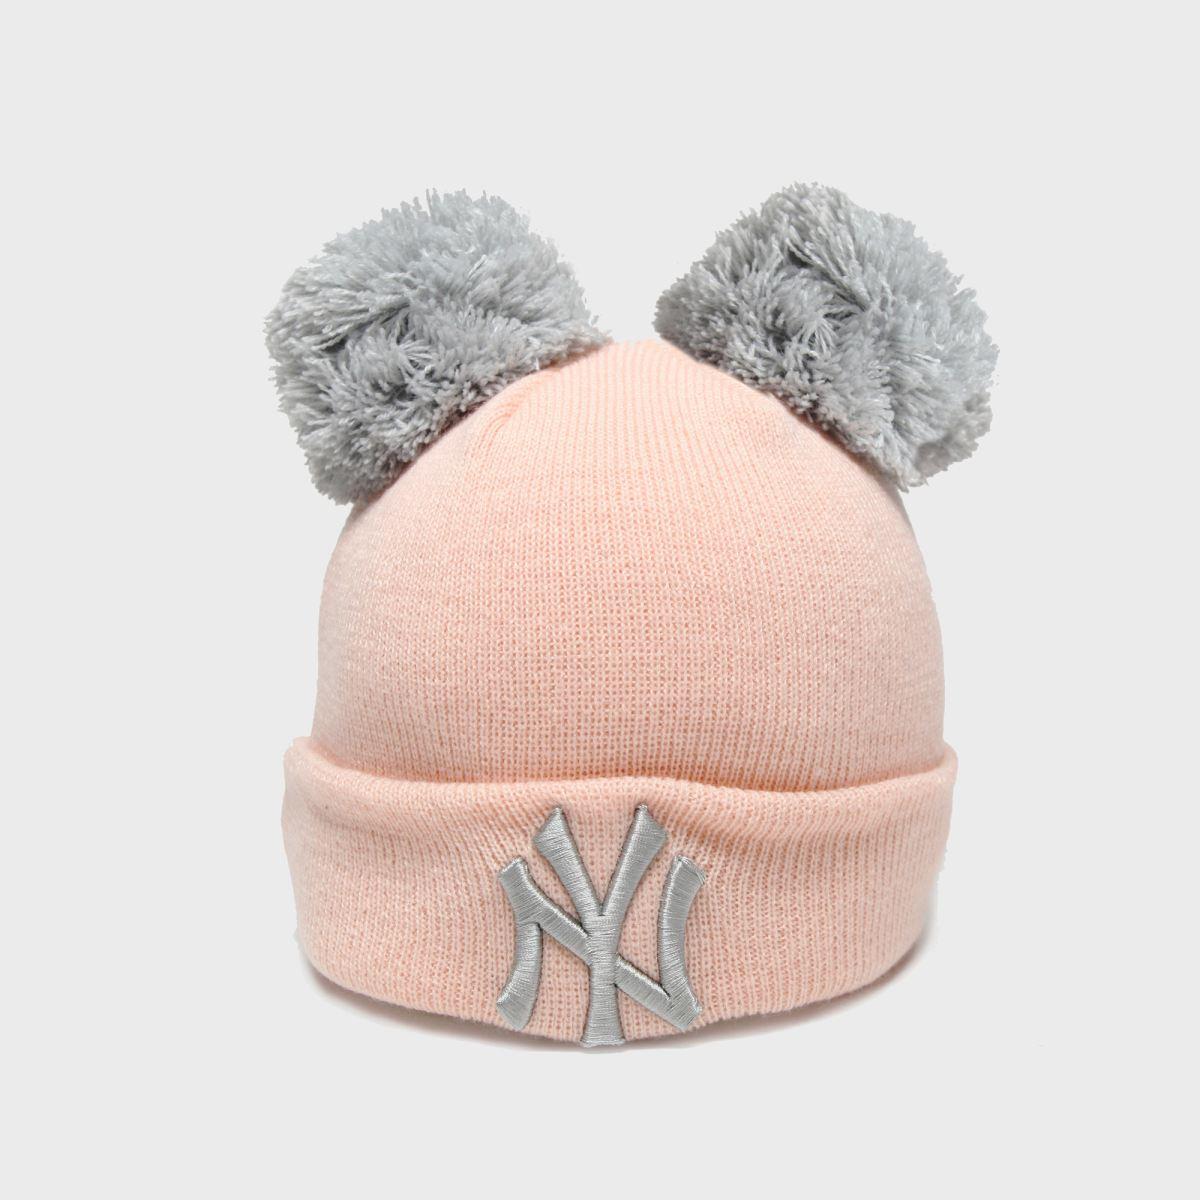 New Era Accessories New Era Pink Kids Double Pom Knit Ny